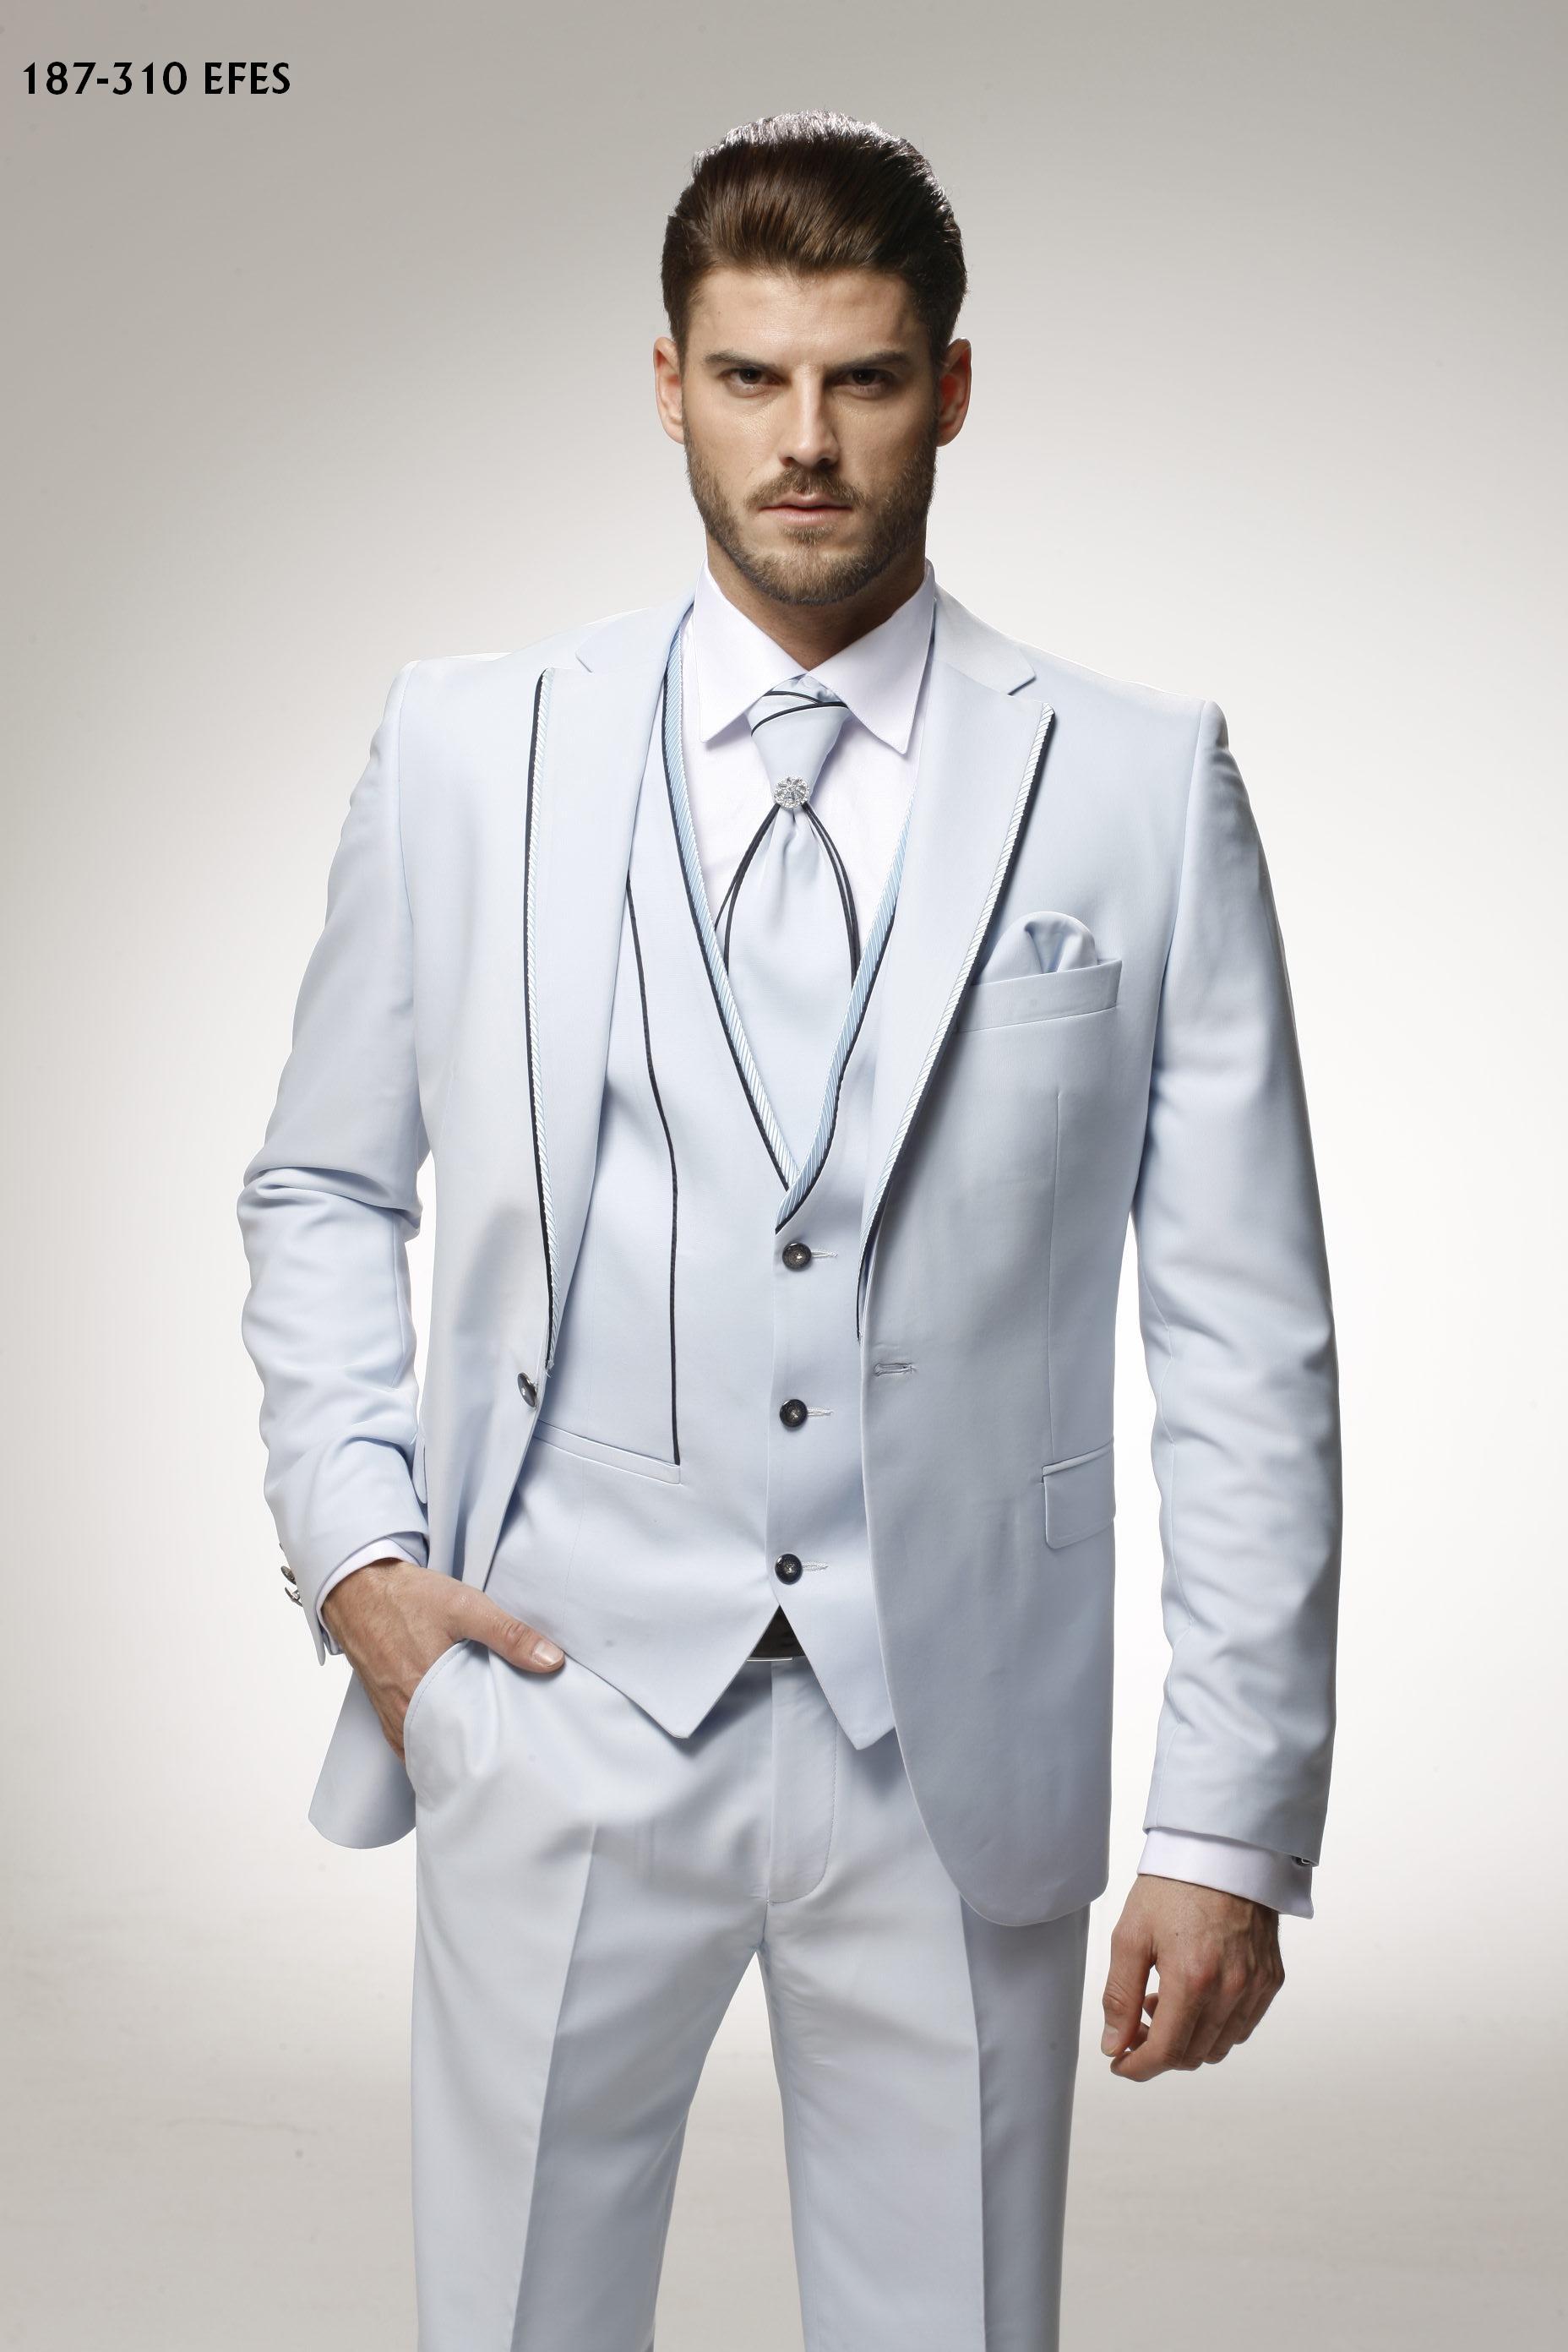 мужской костюм мужской фото